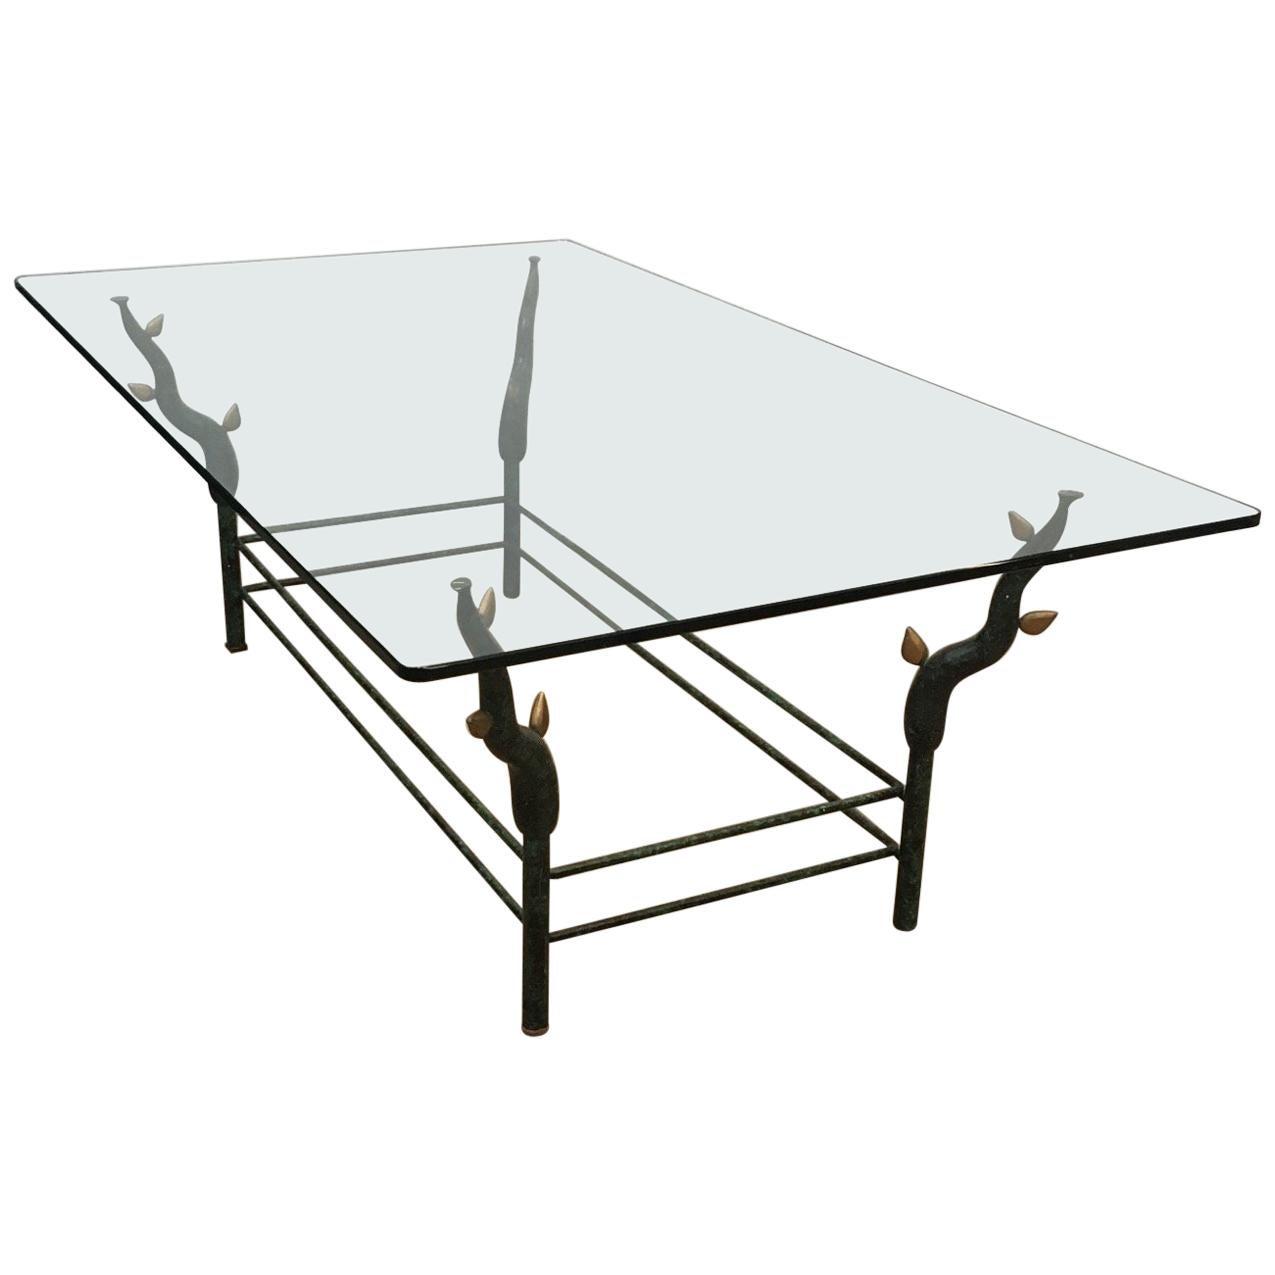 Wrought Iron Coffee Table in the Style of Garouste et Bonetti